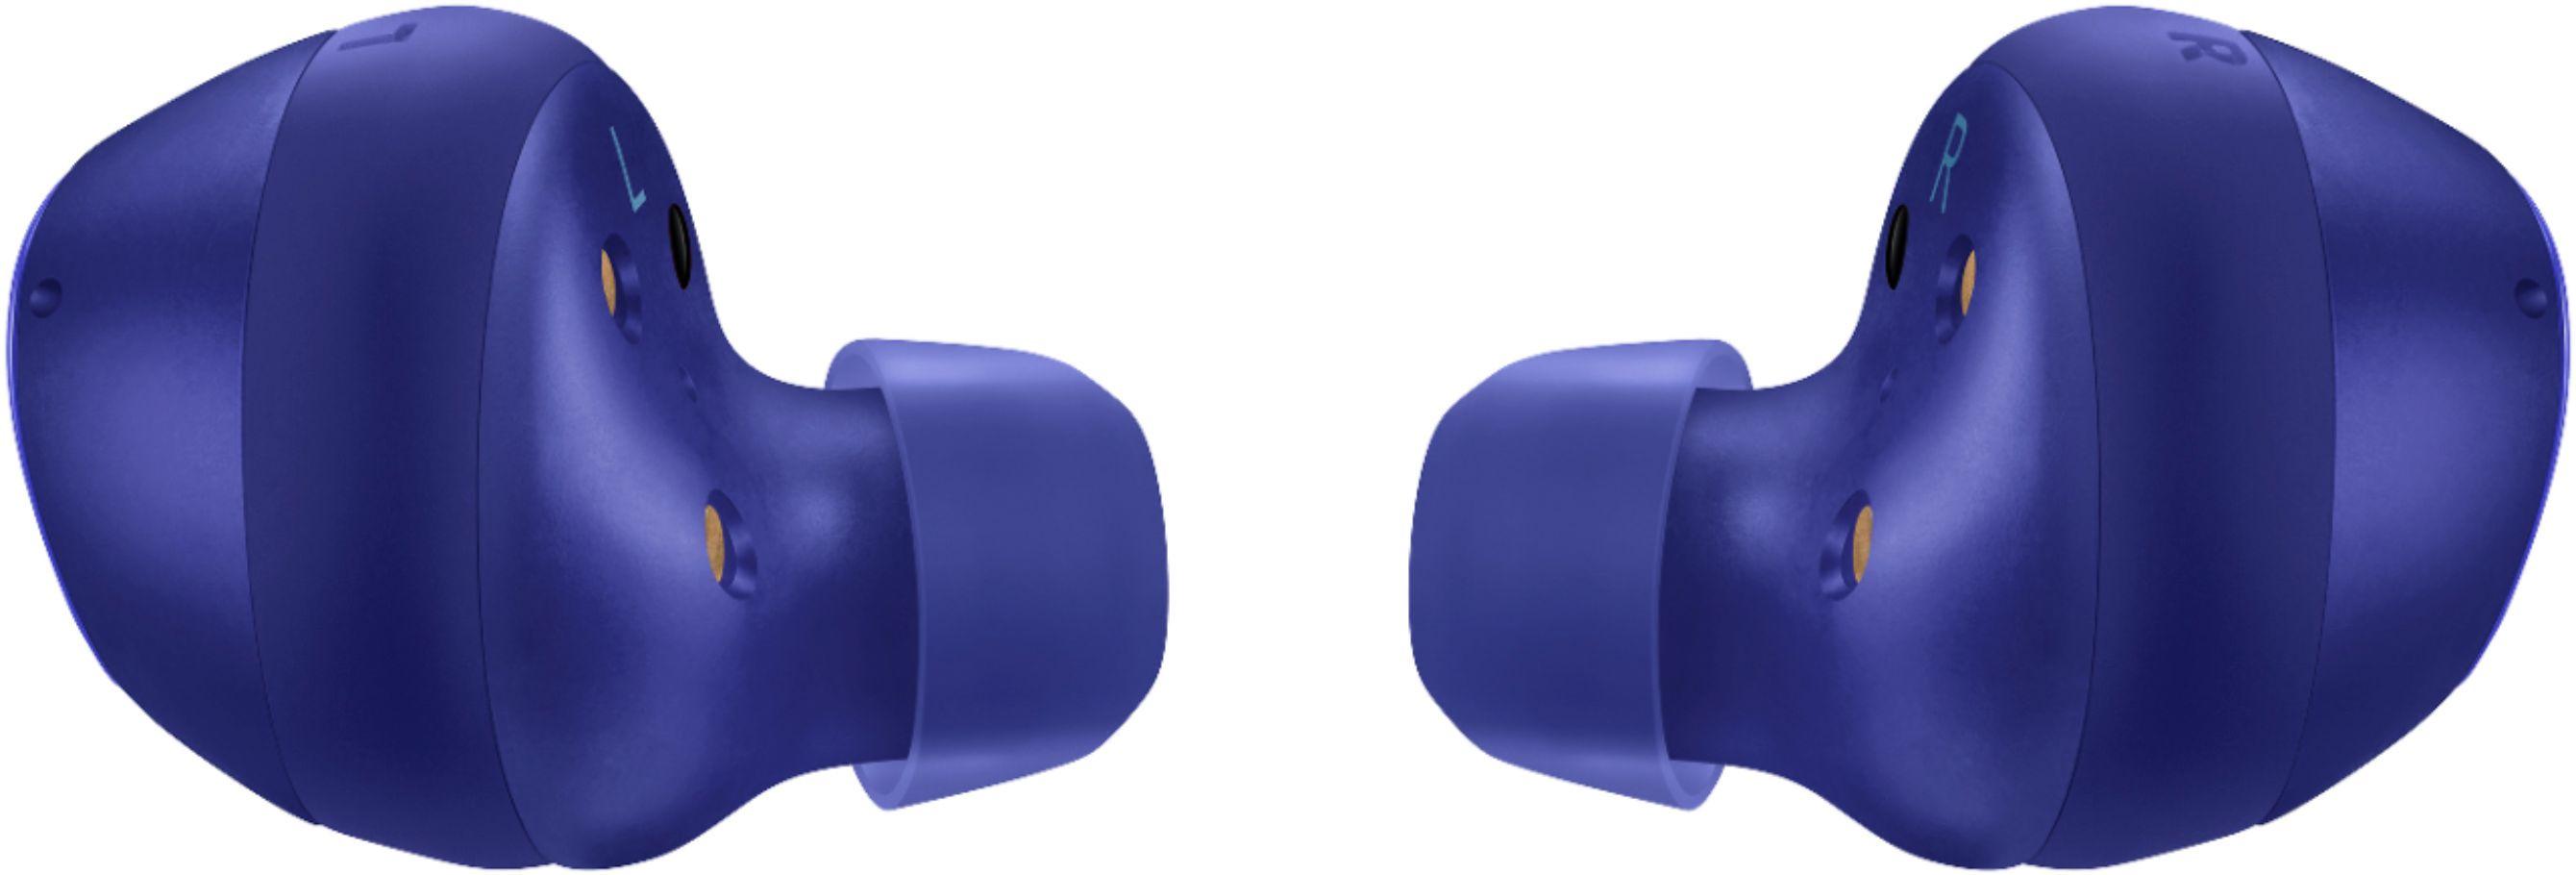 Samsung - Geek Squad Certified Refurbished Galaxy Buds+ True Wireless Earbud Headphones - $69.99